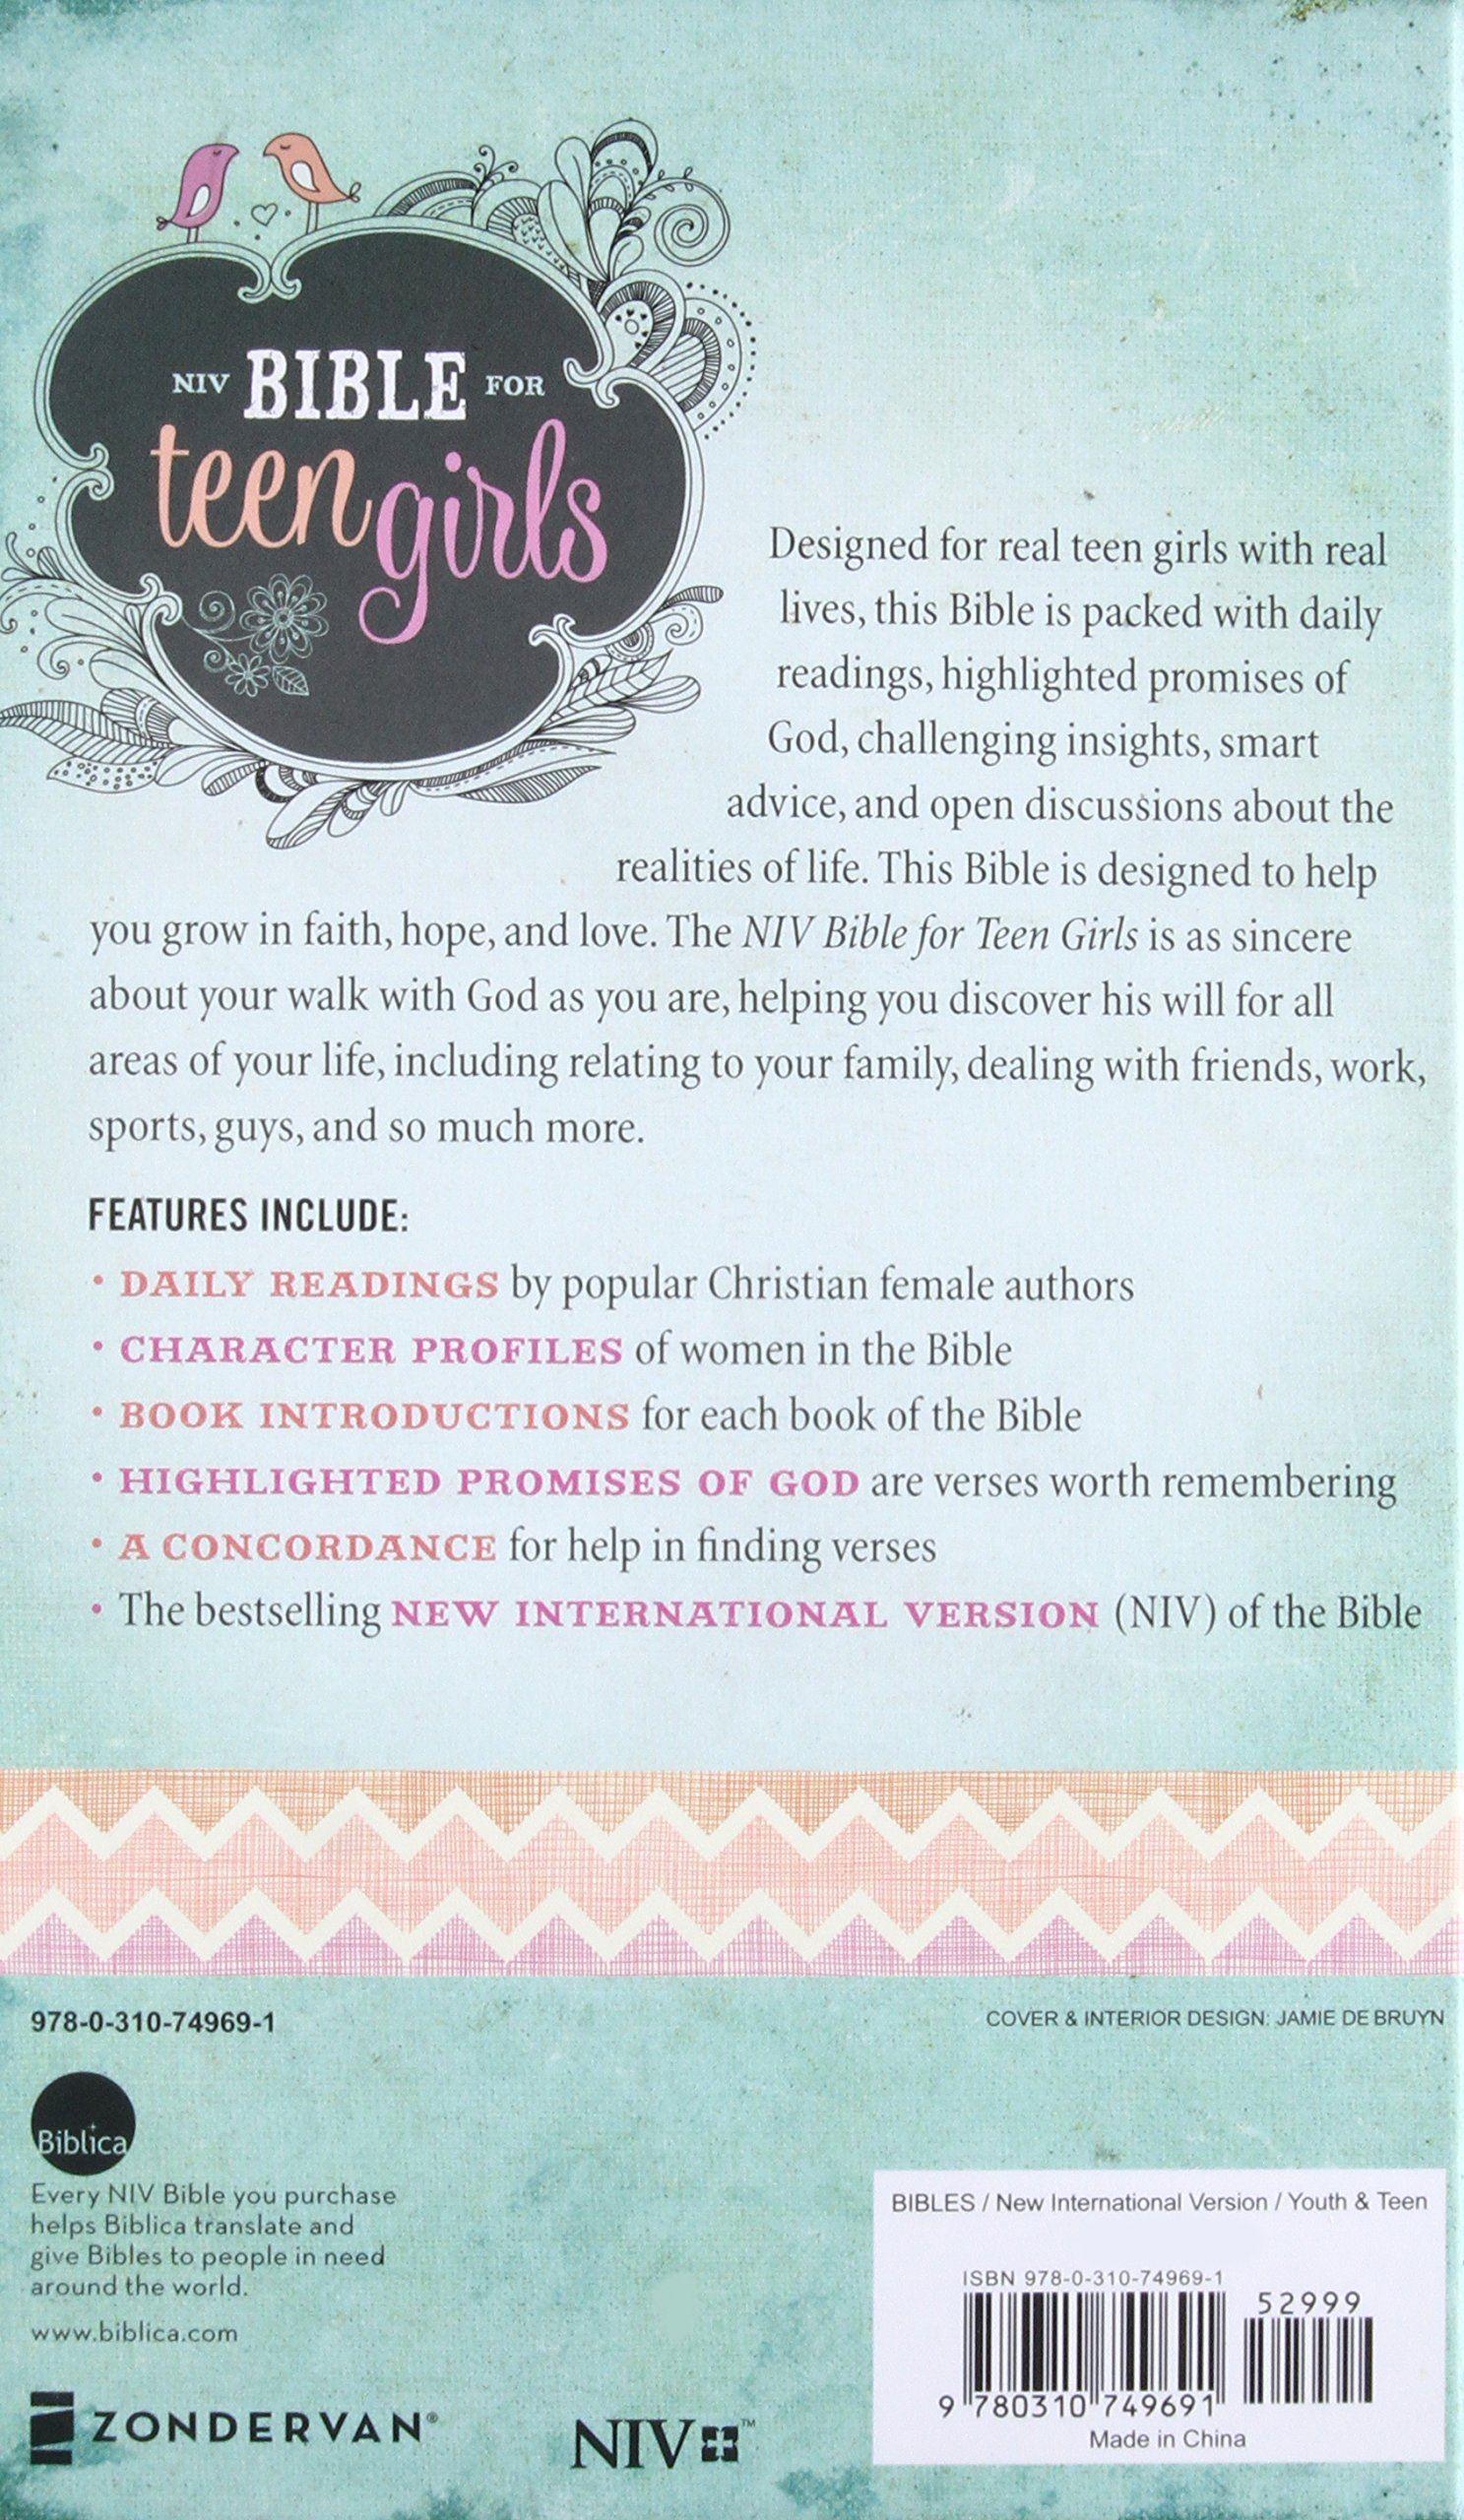 niv bibles, niv study bibles, new international bibles